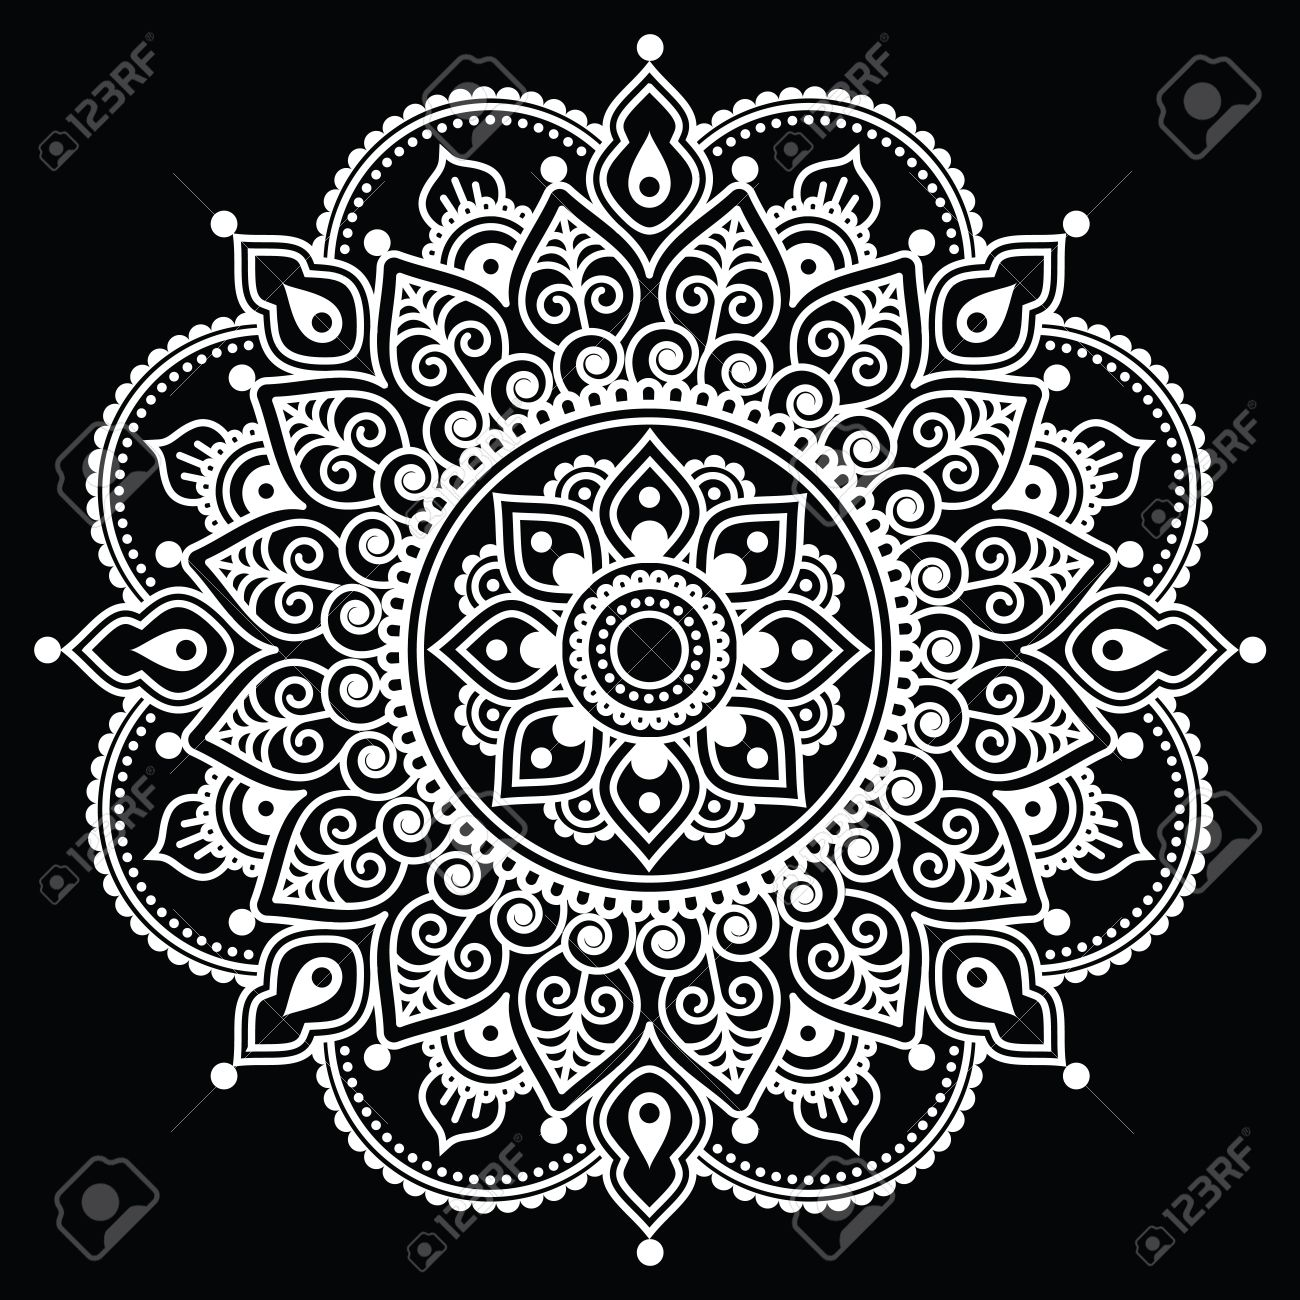 Mehndi Indian Henna Tattoo White Pattern On Black Background